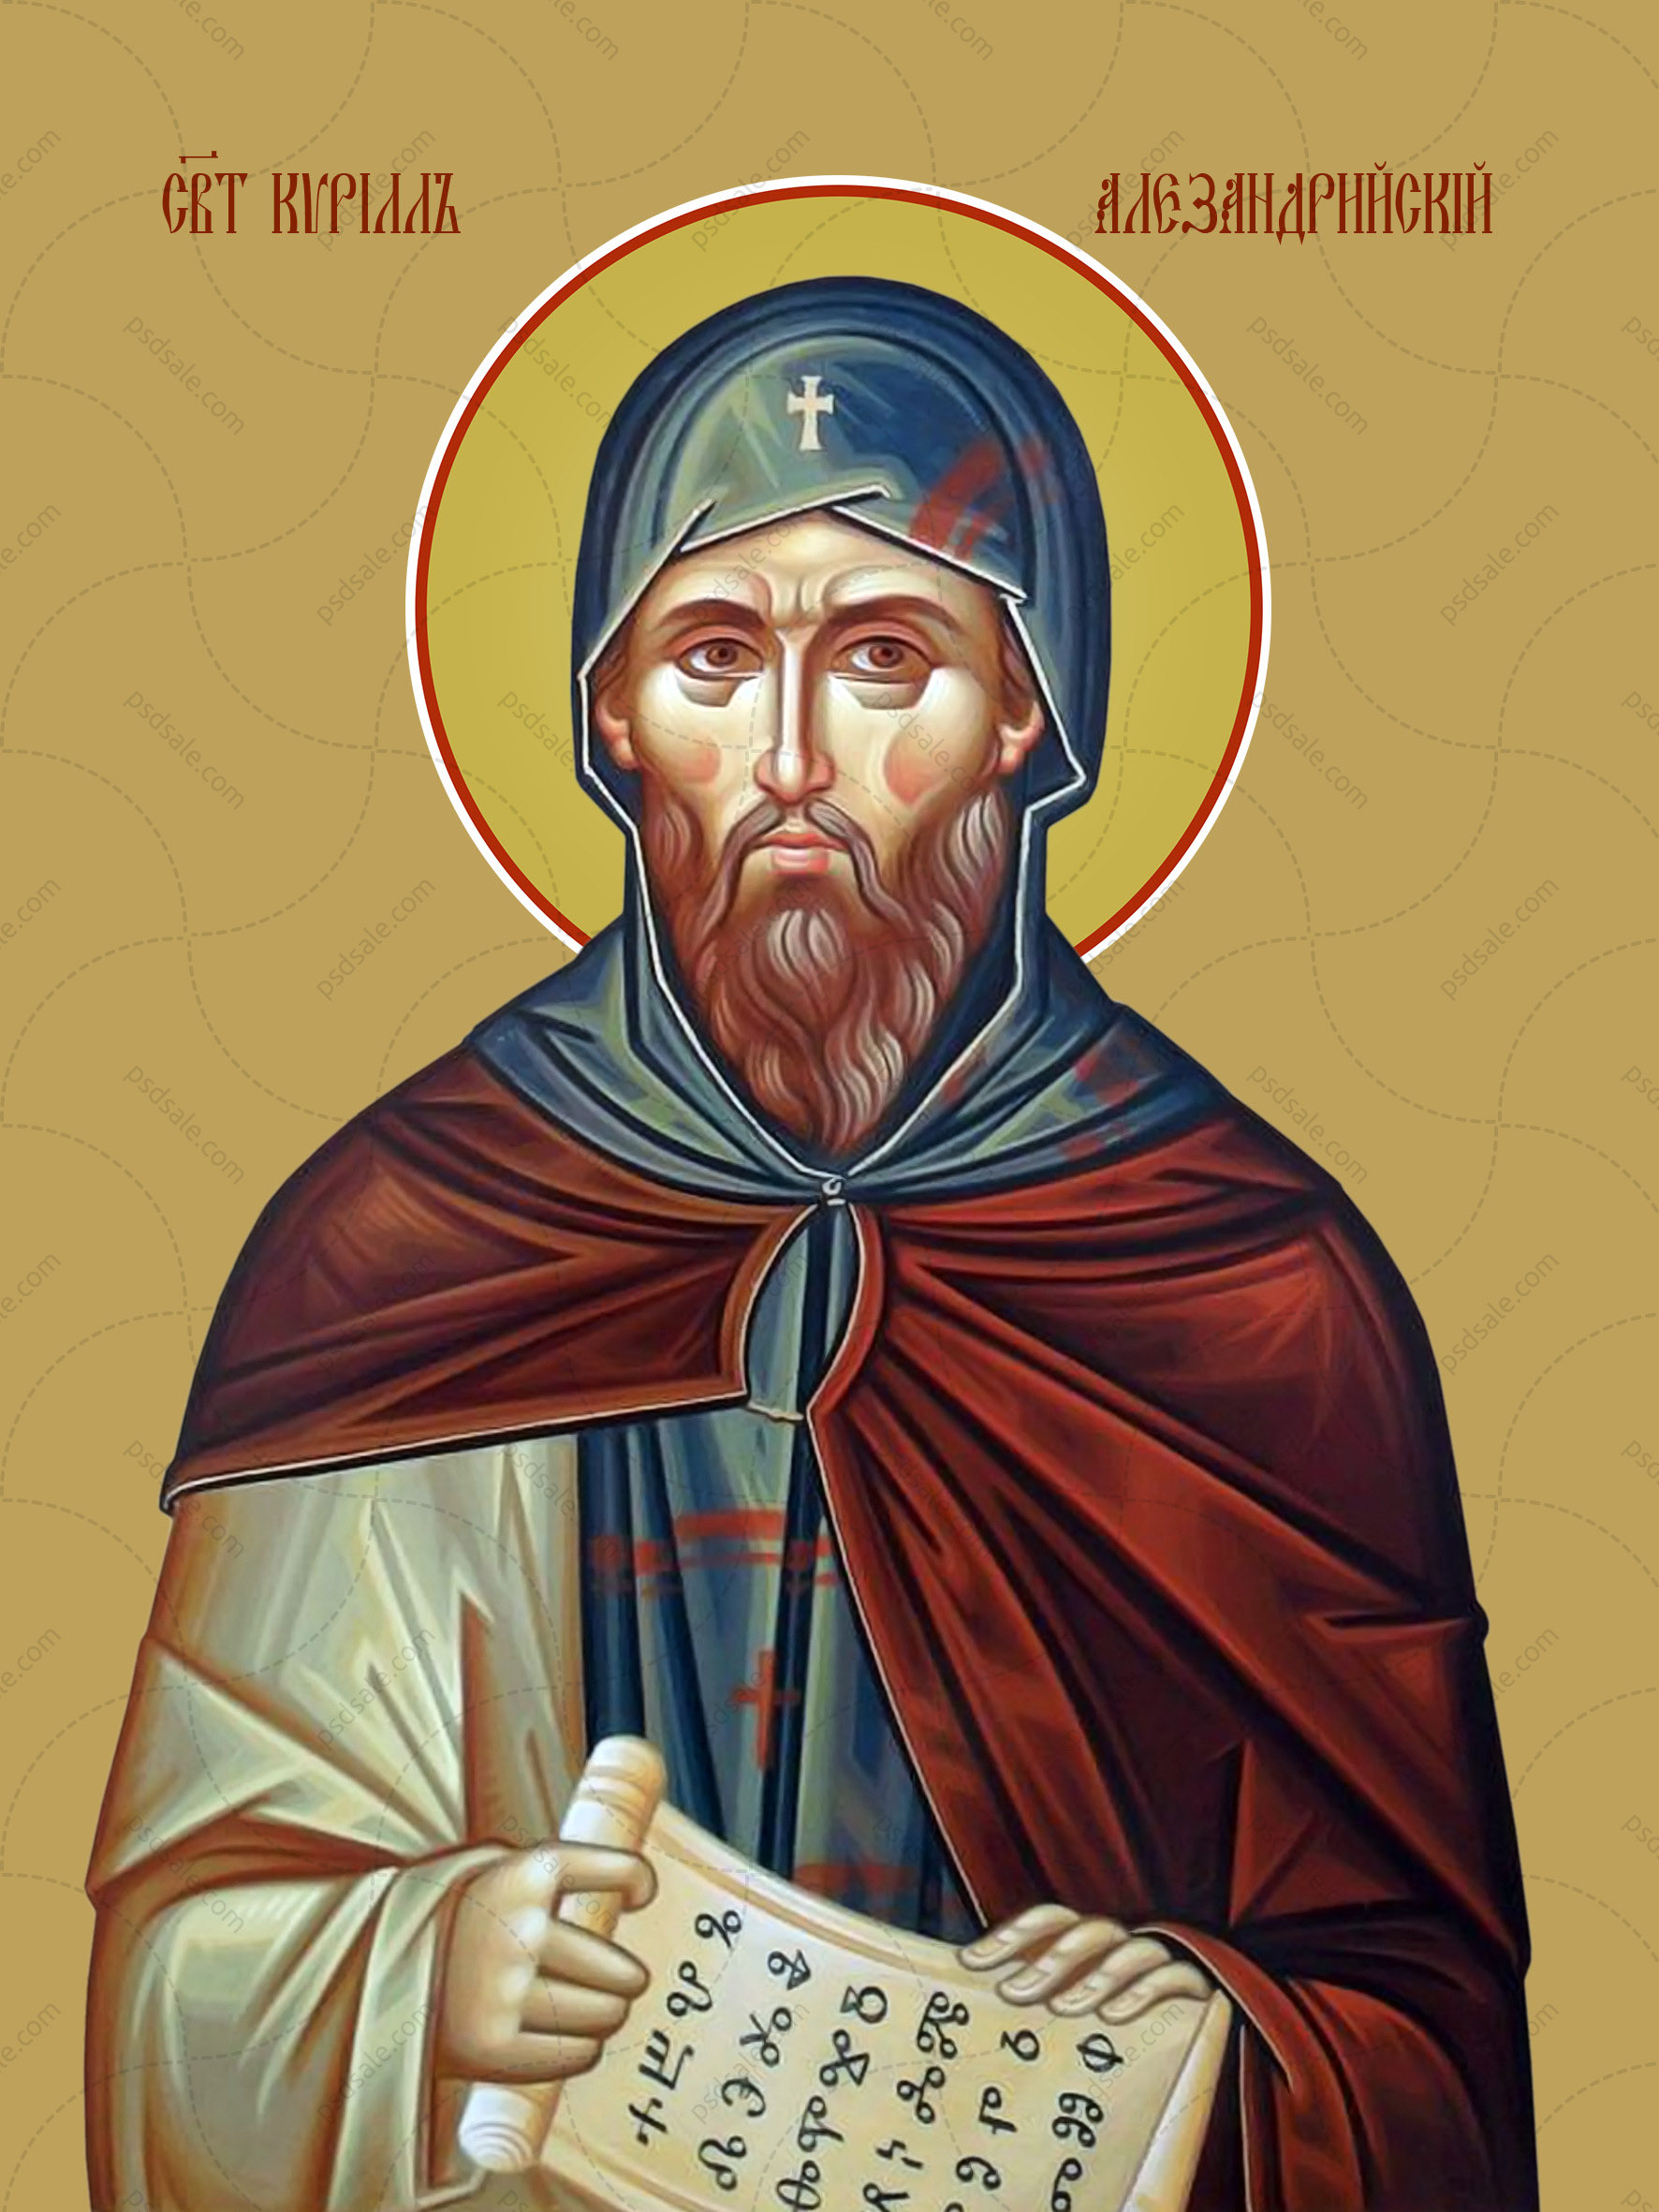 Кирилл Александрийский, святитель